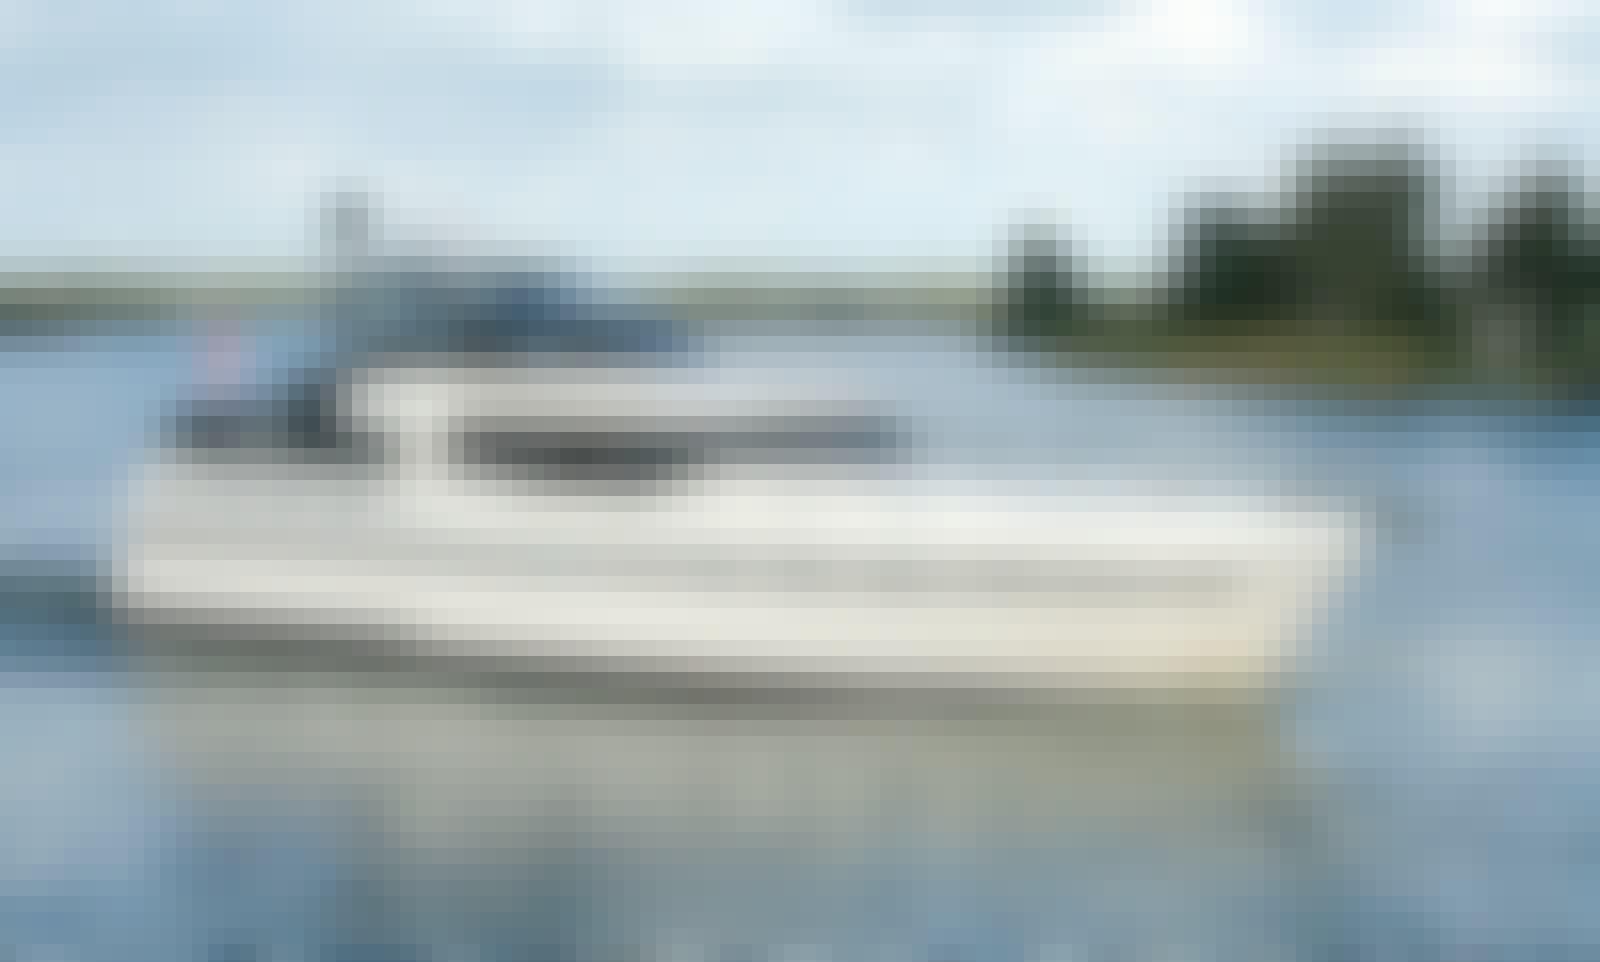 44' Tyvano 1340 Motor Yacht Charter in Drachten - Friesland, Netherlands